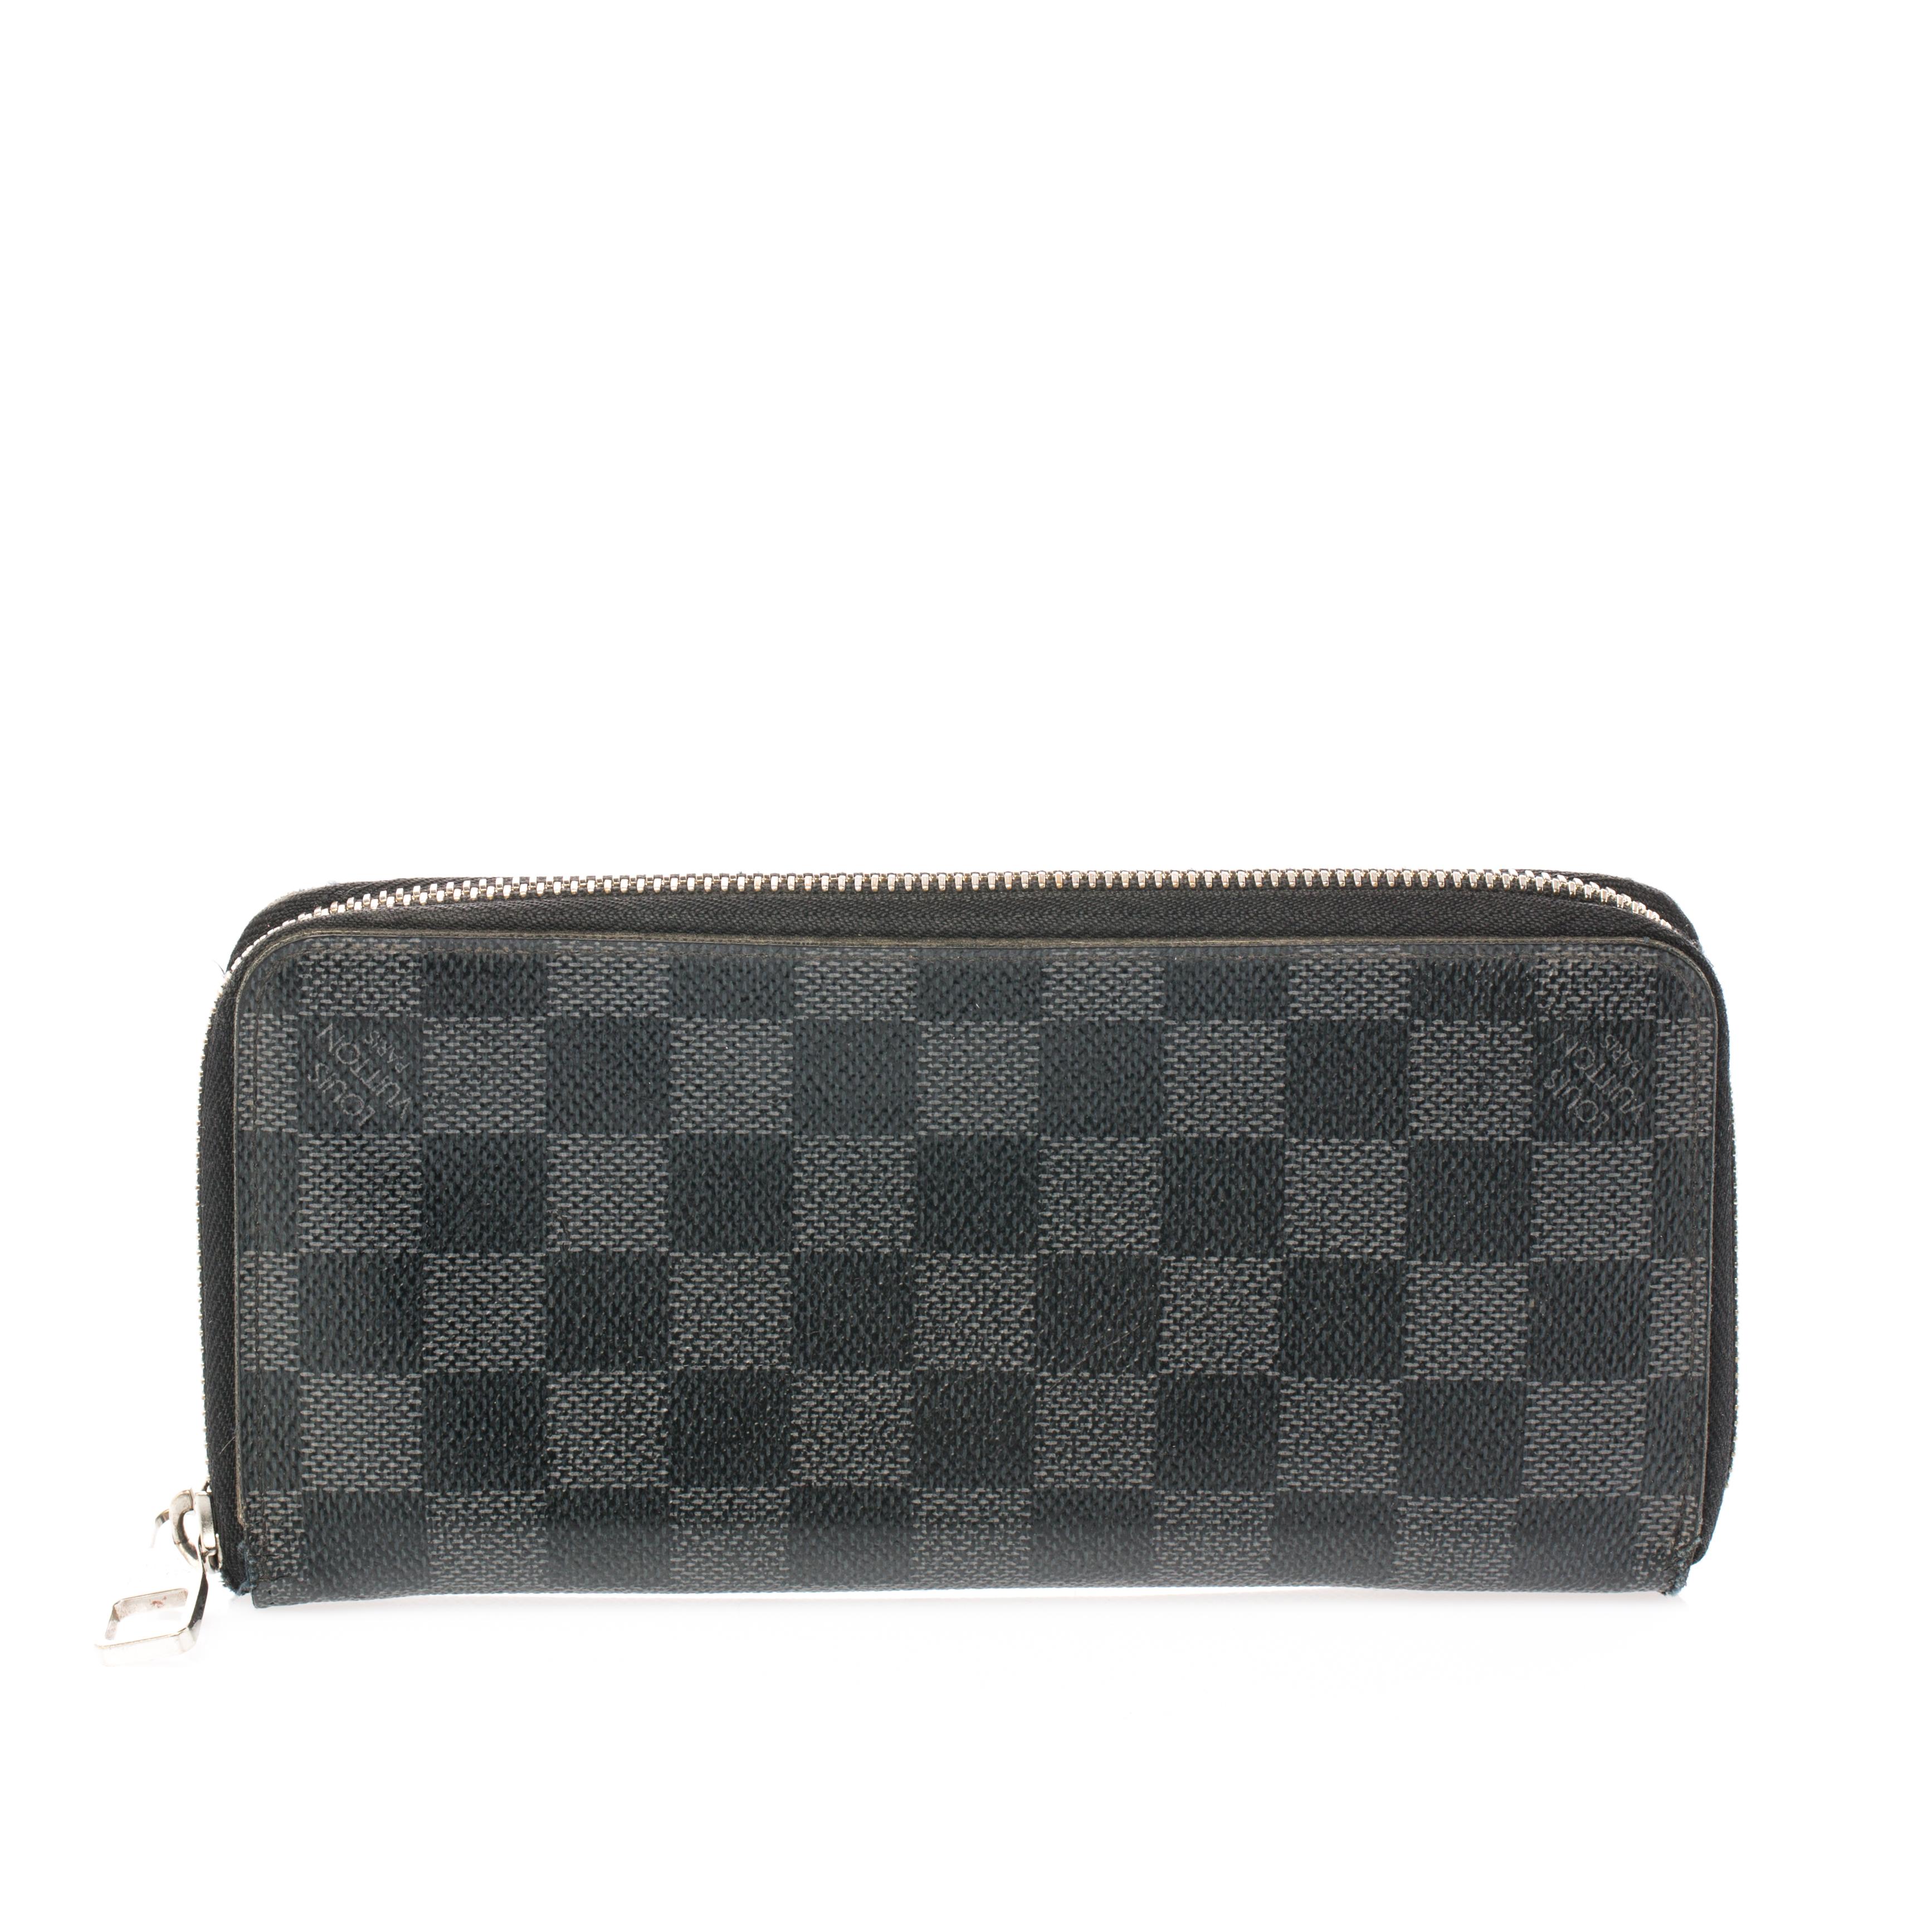 4a0a949eedd Louis Vuitton Damier Graphite Canvas Vertical Zippy Wallet